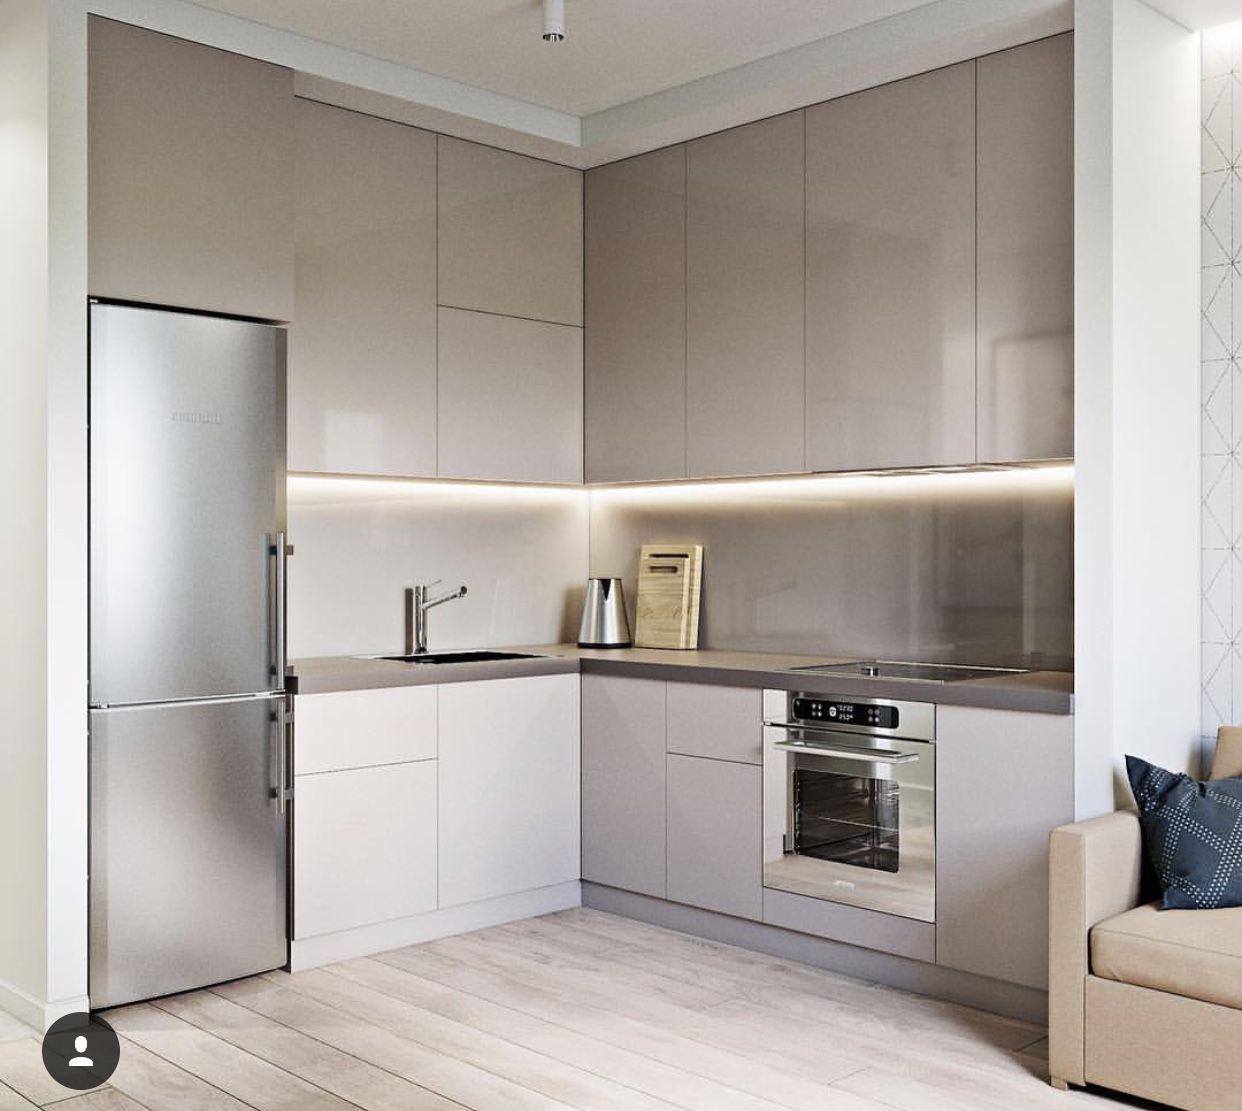 Pin By Monika B K On Kuchnia Pinterest Kitchens Interiors And  # Neat Muebles Merida